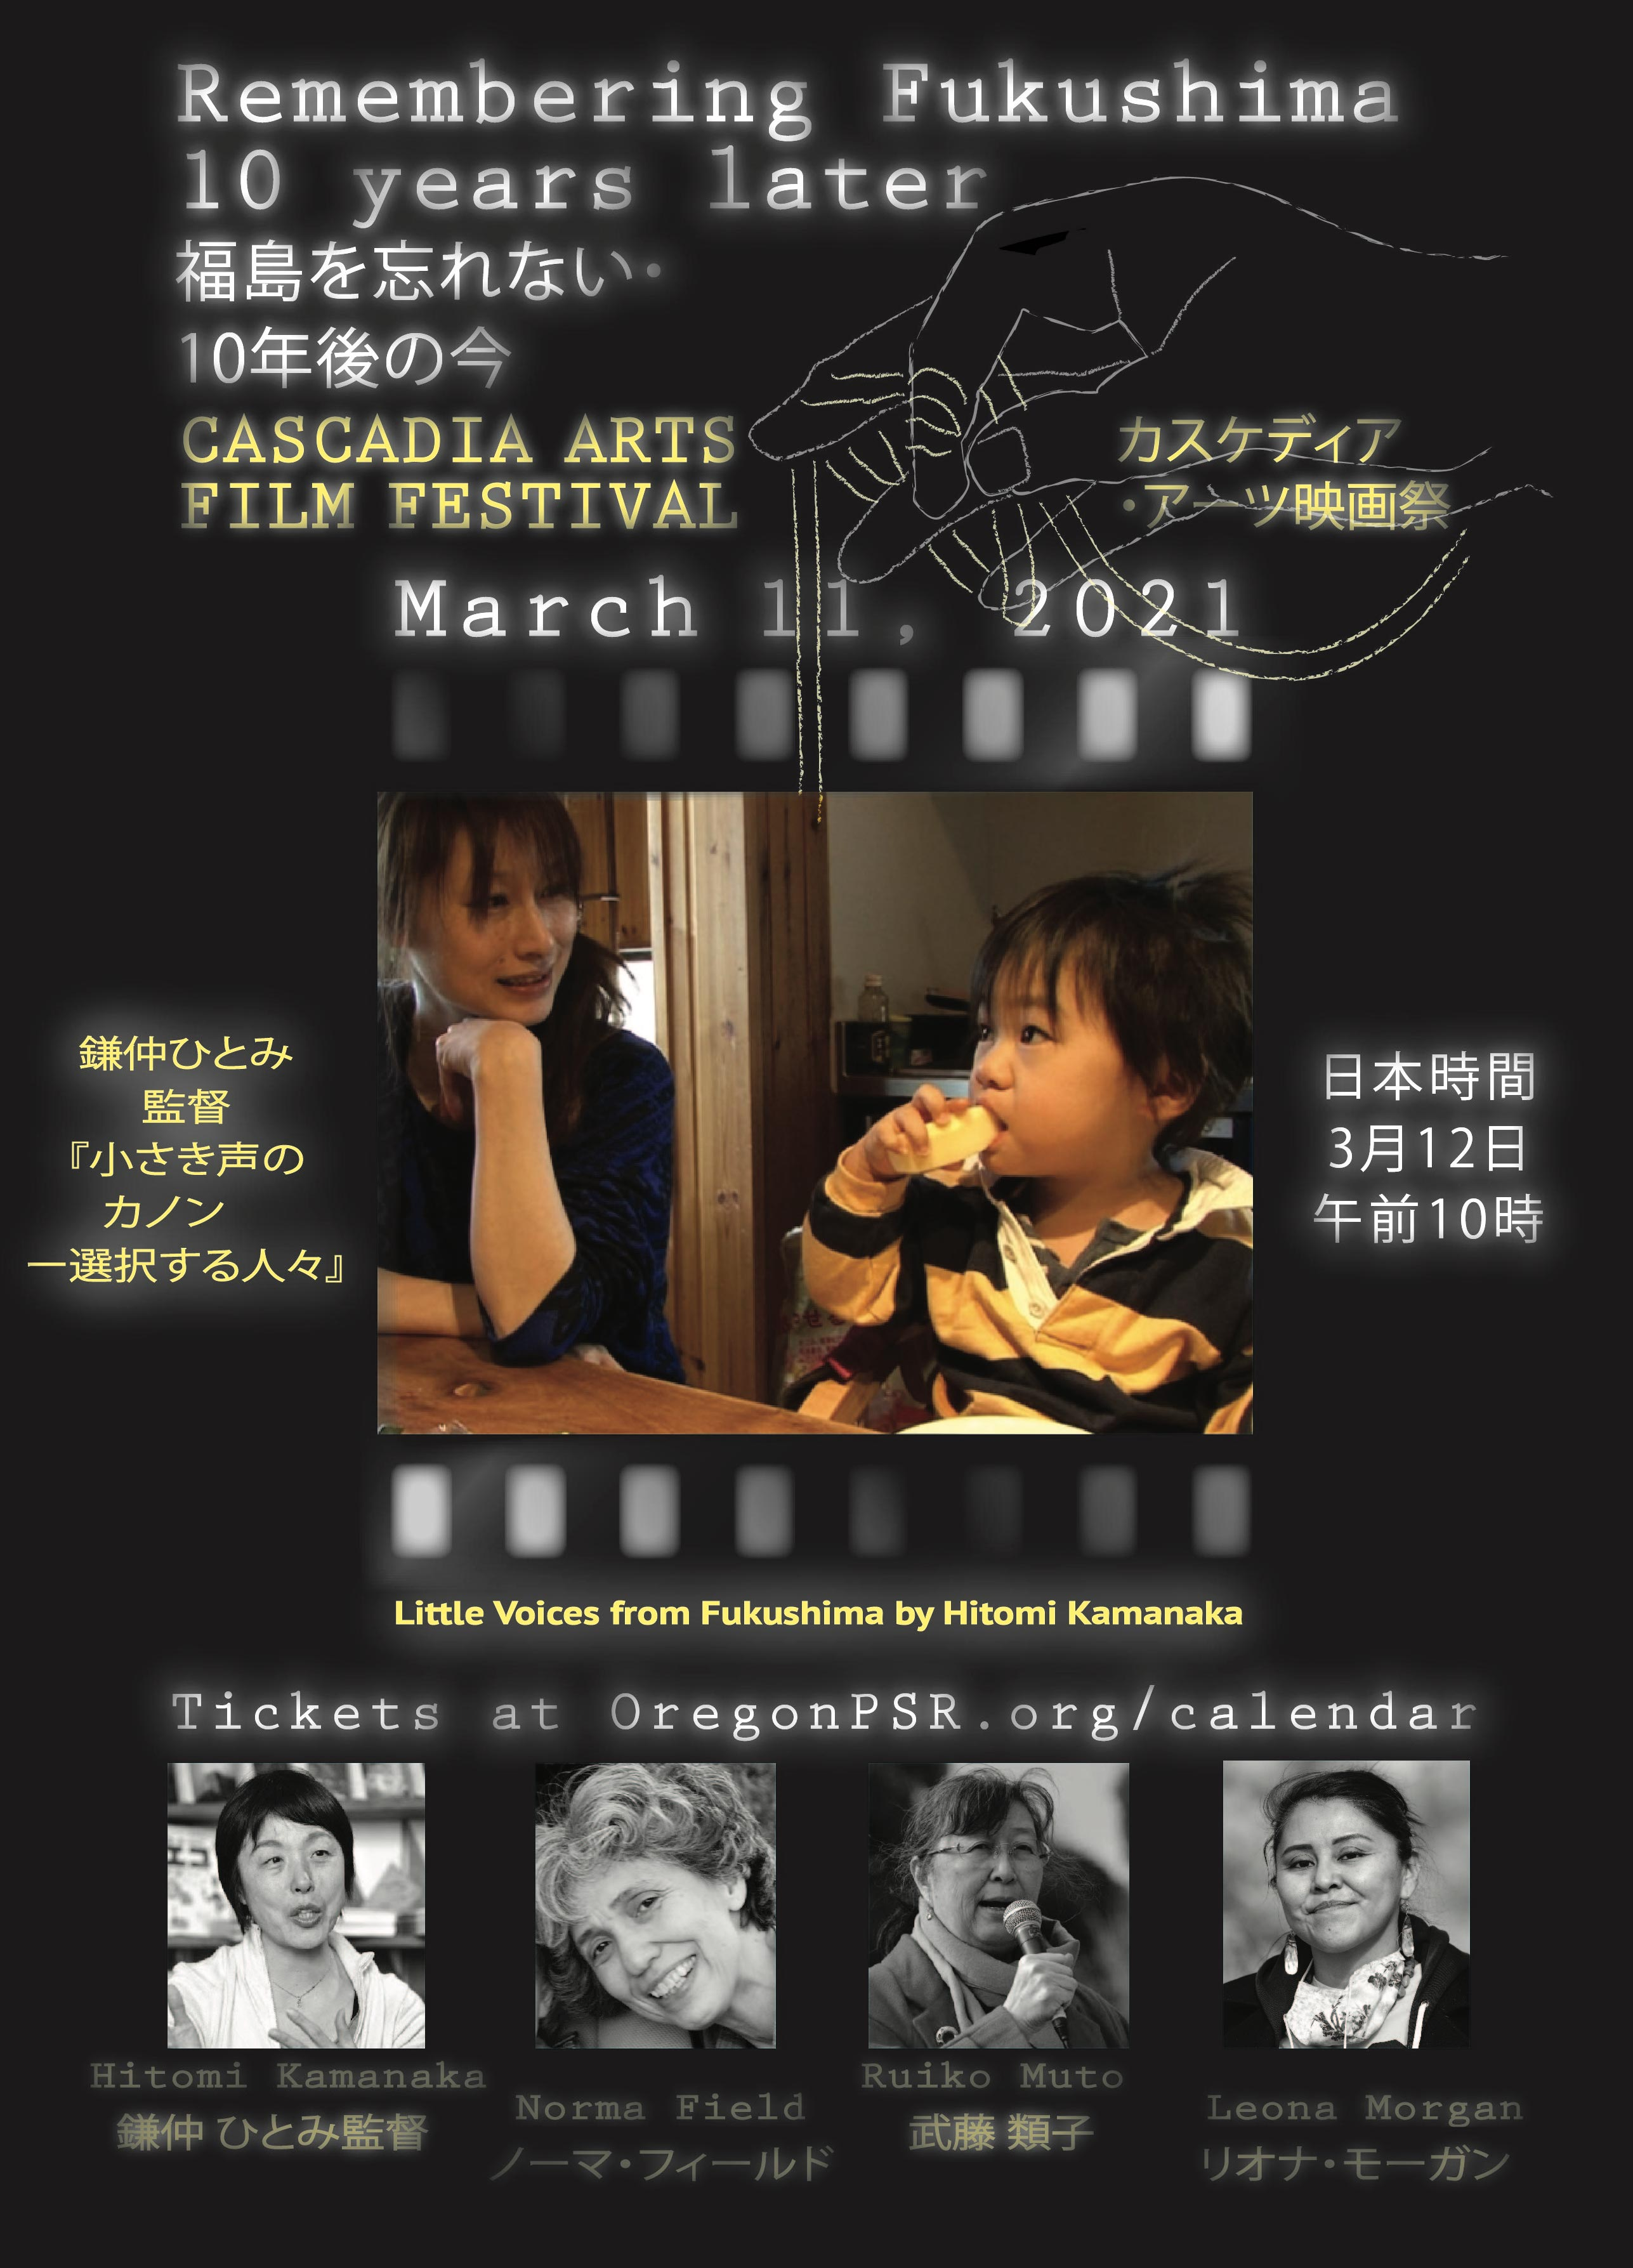 Remembering_Fukushima_10_Years_Later_flyer_(2-23-21_version).jpg